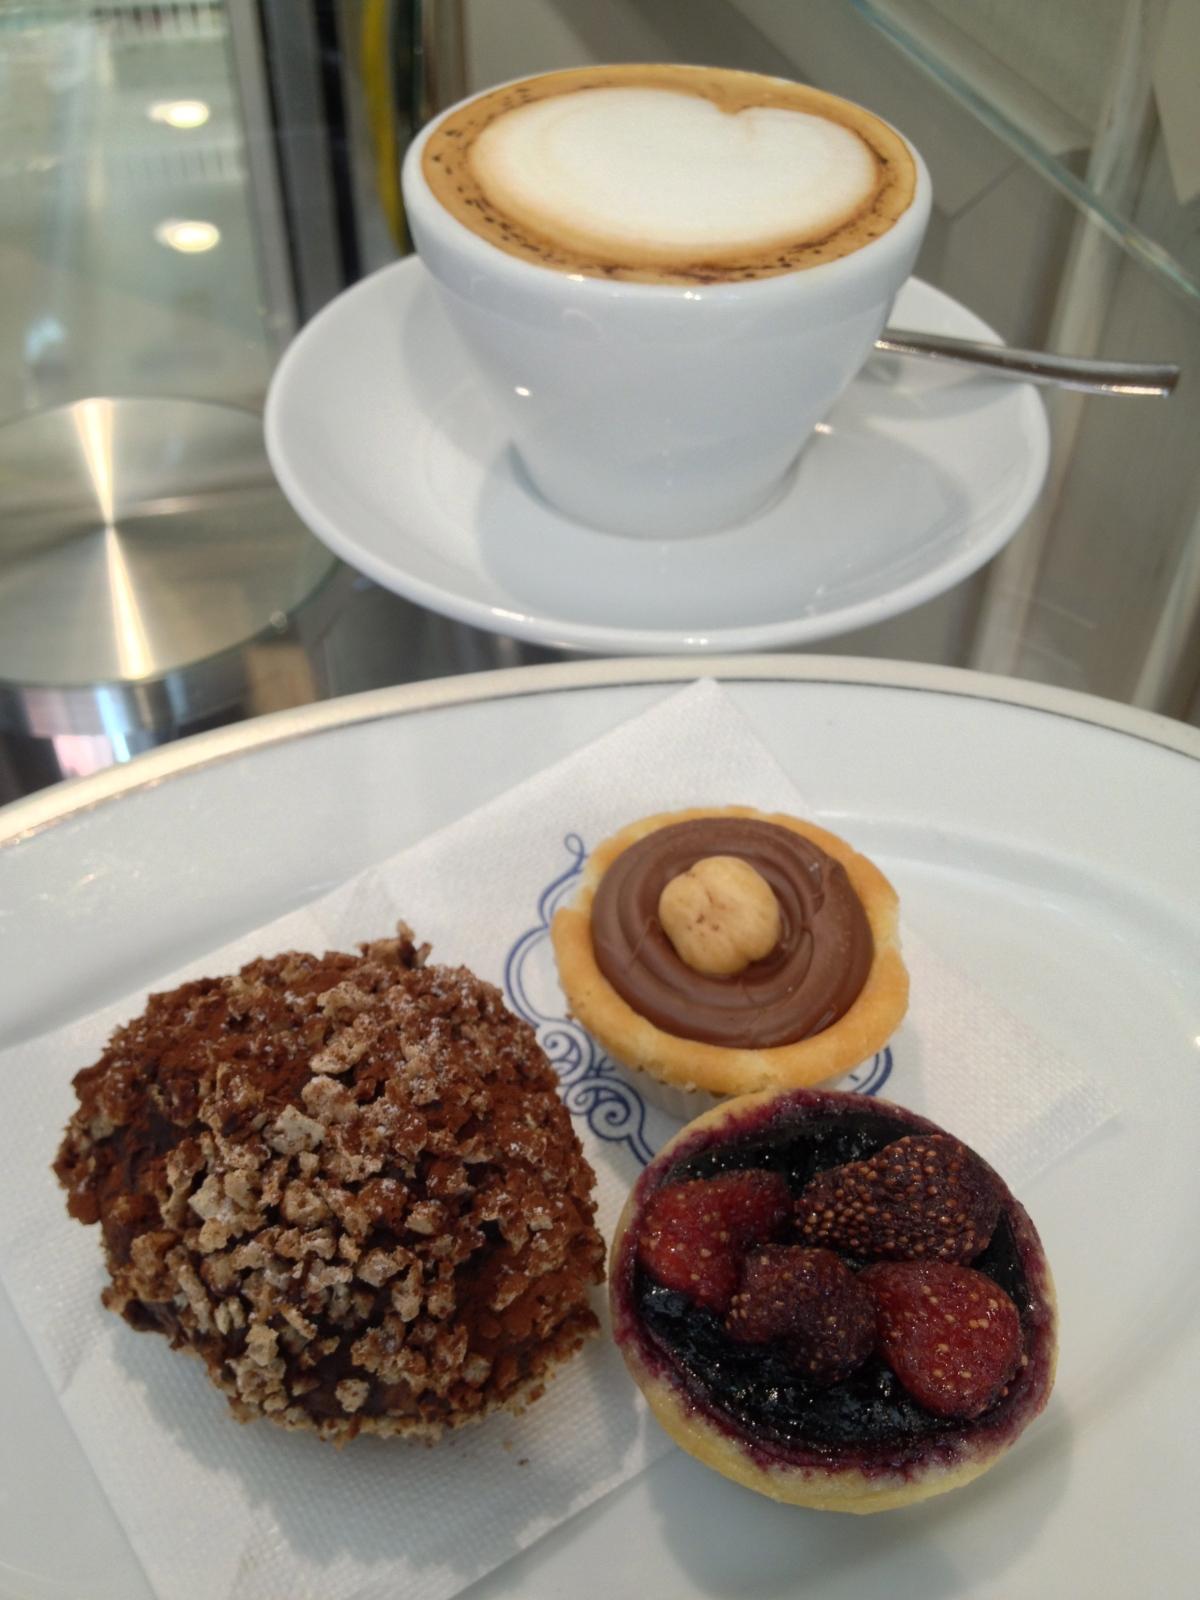 Cappuccino, Pastries